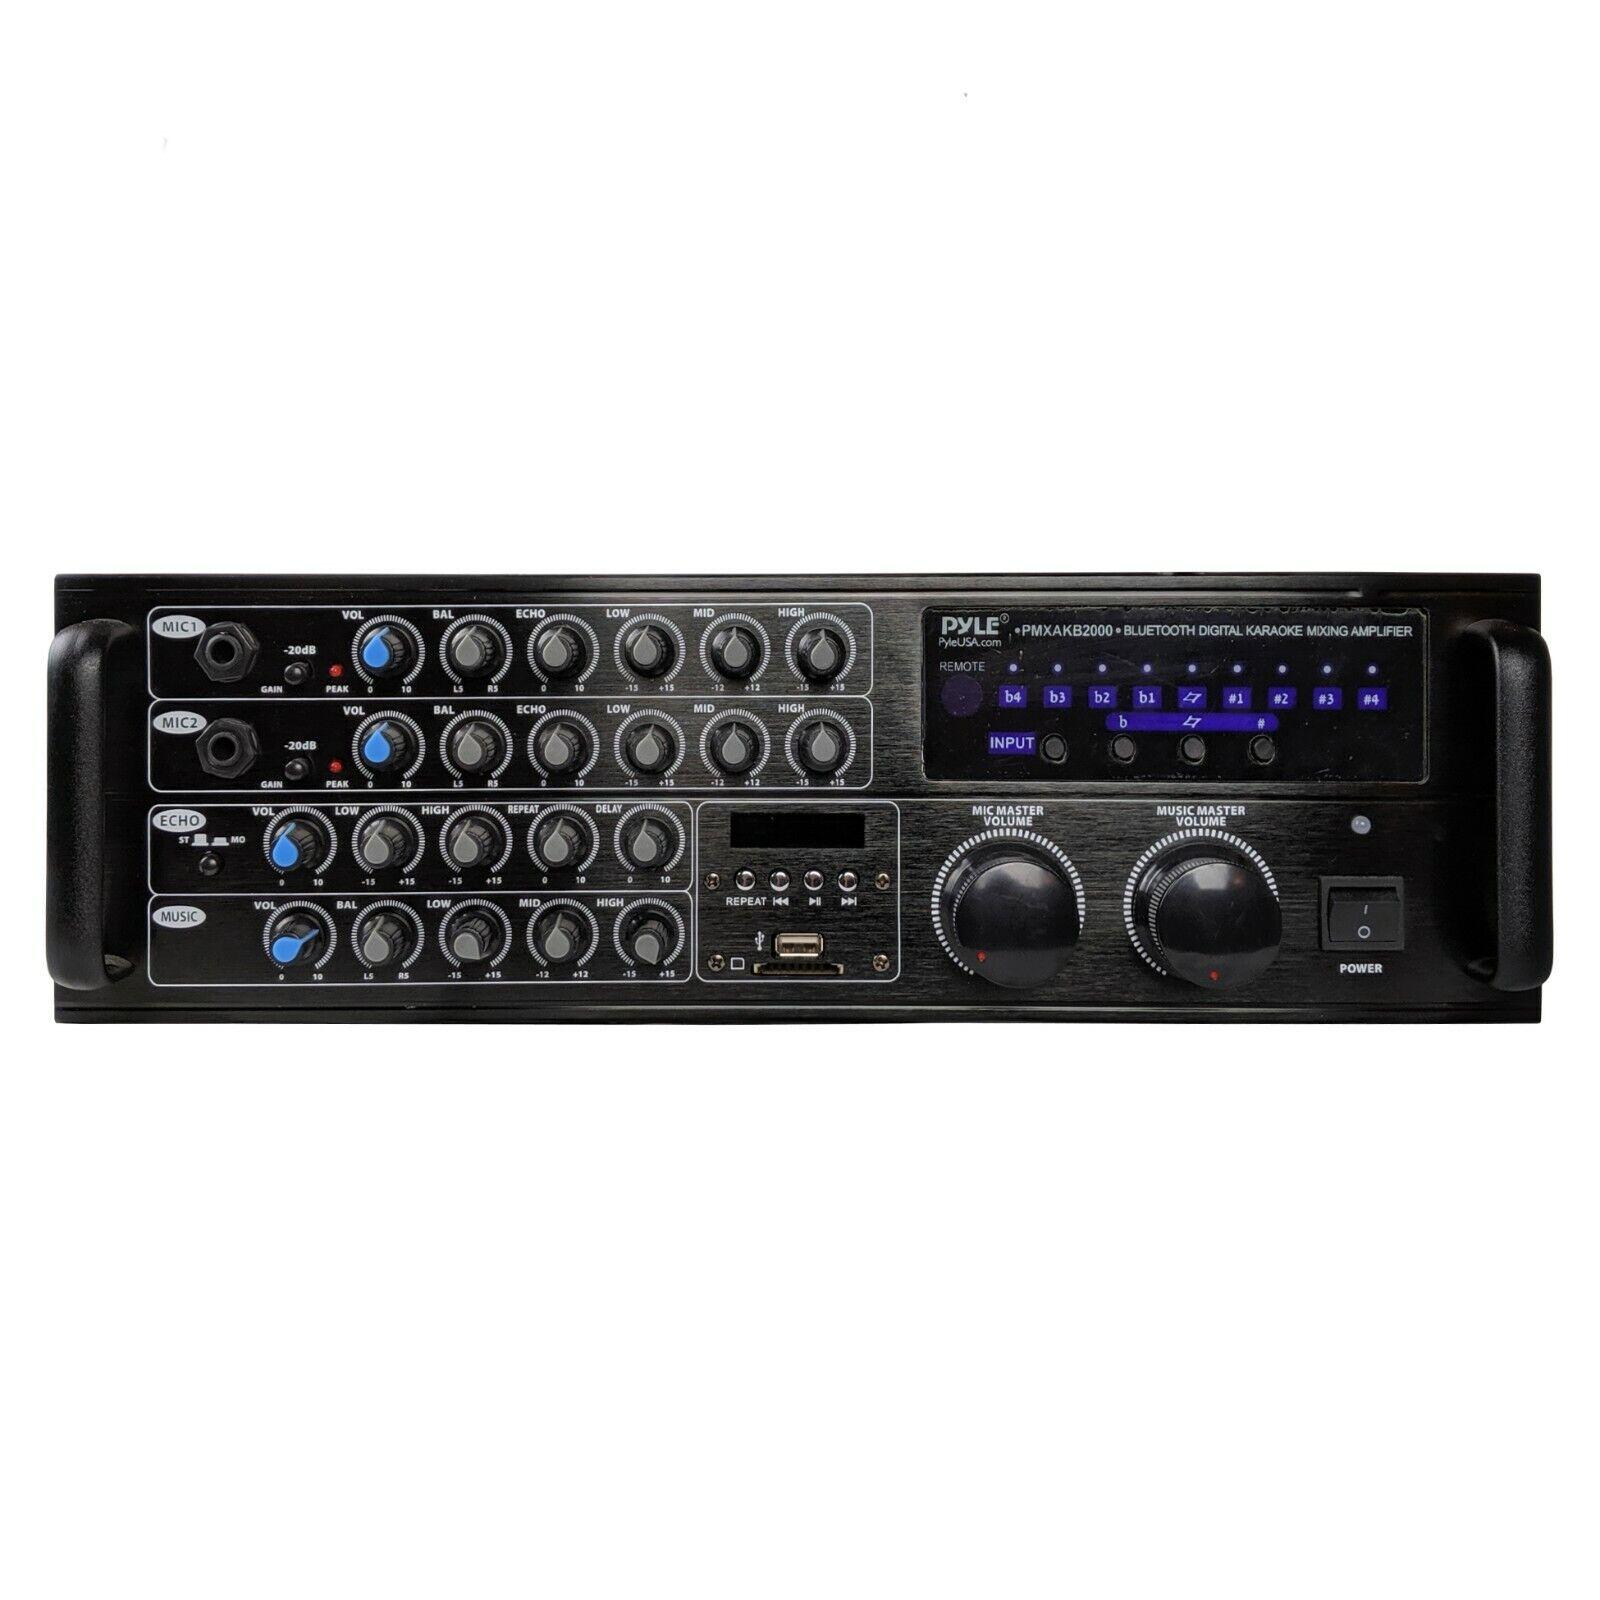 Pyle PMXAKB2000 - 2000 Watts  DJ Karaoke Mixer and Amplifier